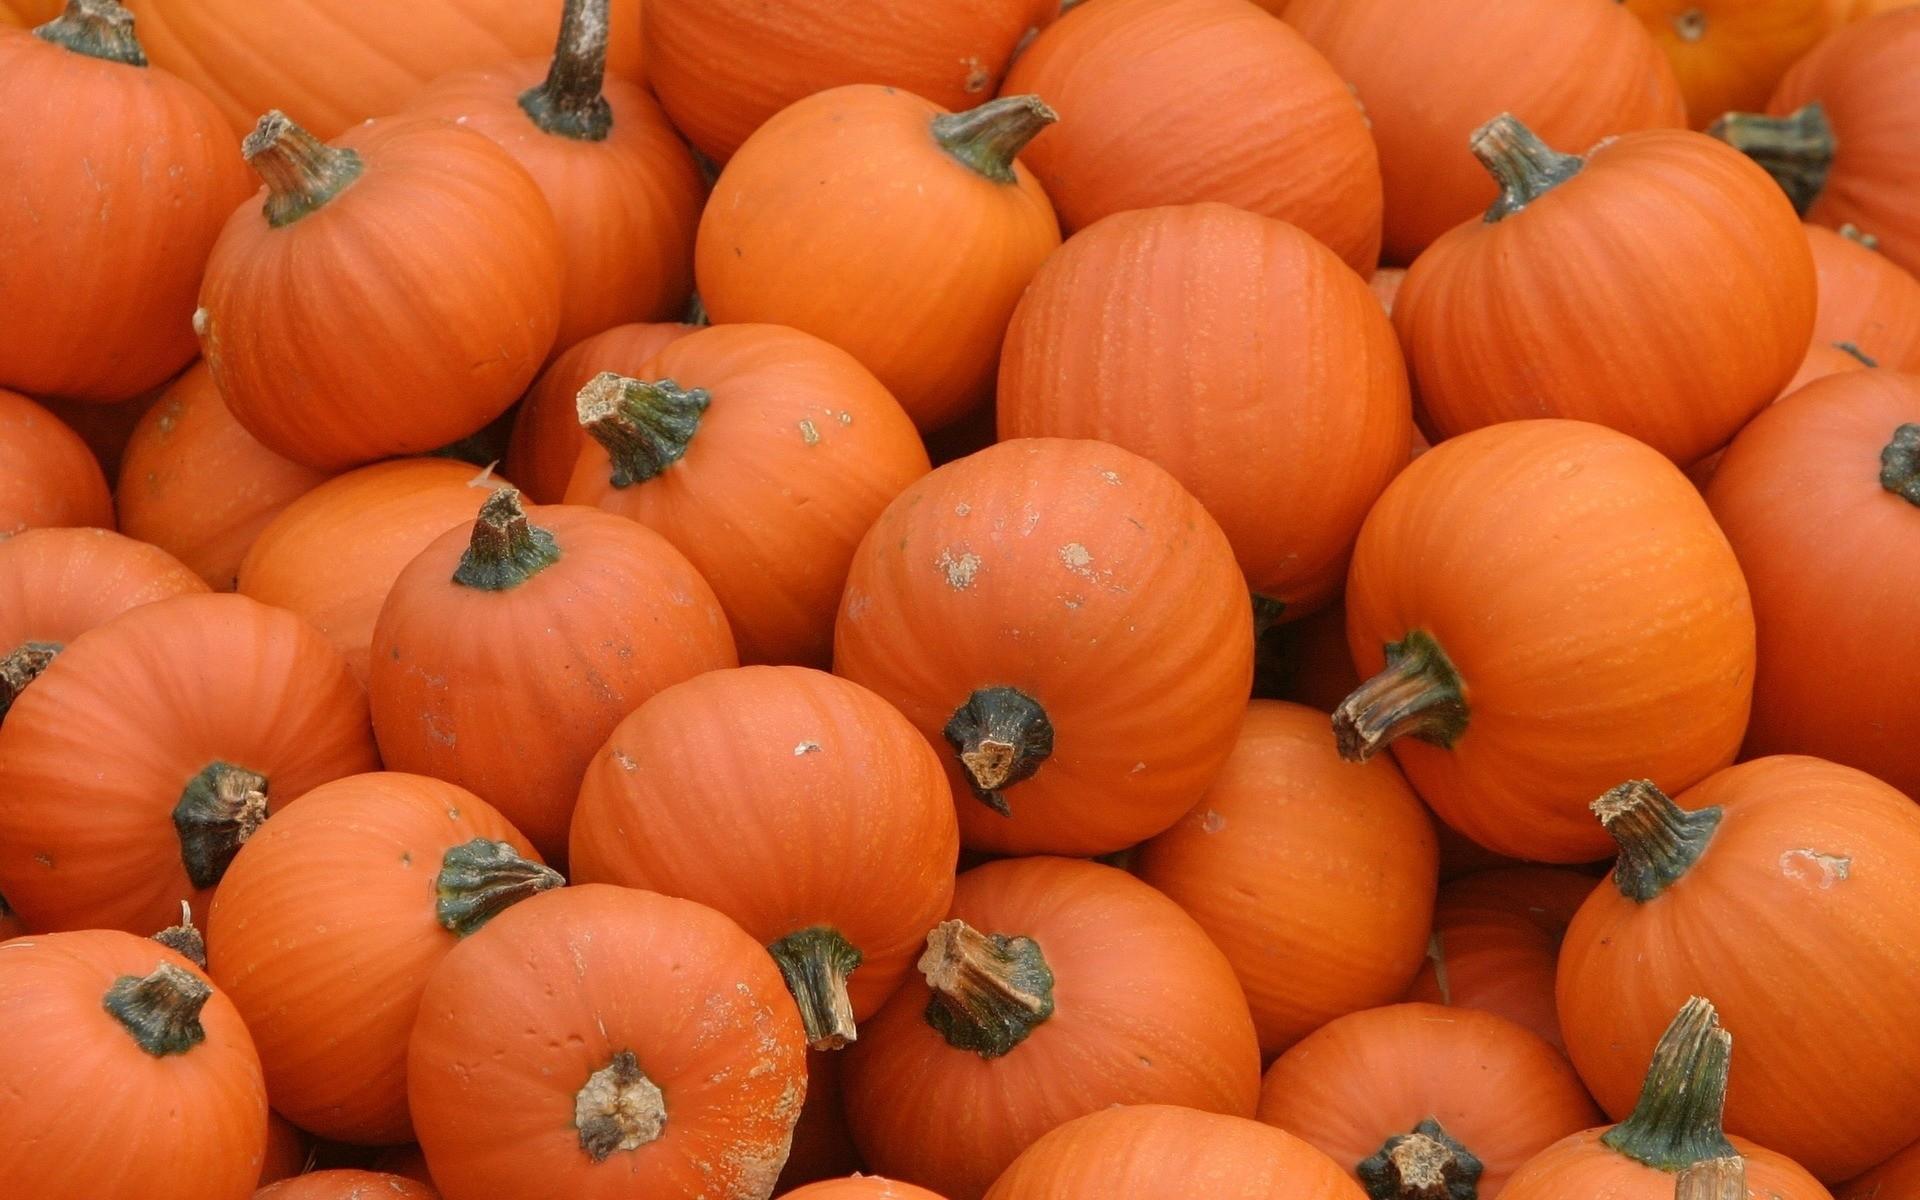 Autumn Pumpkins Desktop Wallpaper 50+ images